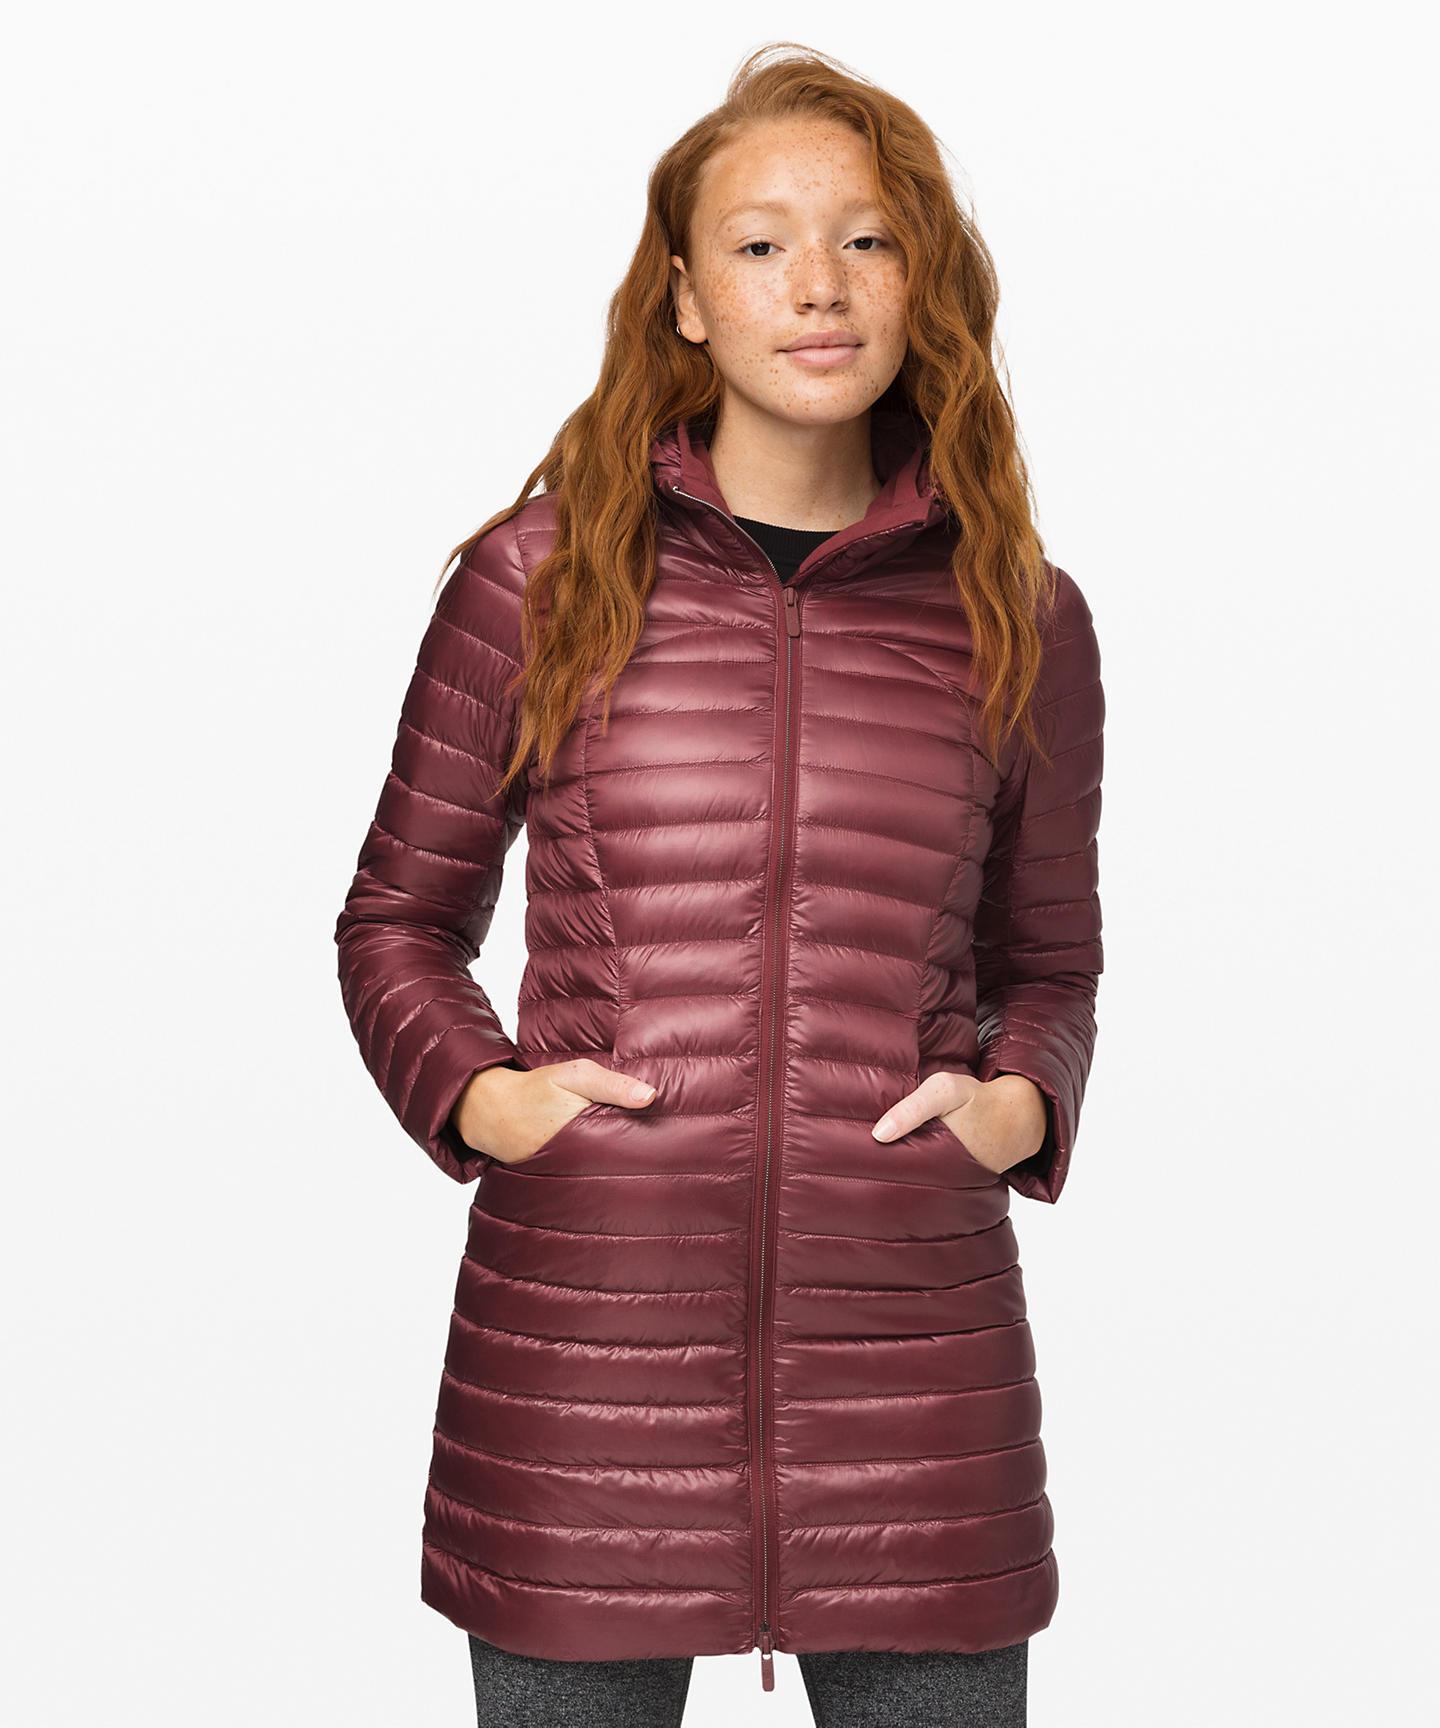 Pack It Down Long Jacket  Shine, Last Lululemon Upload For 2019